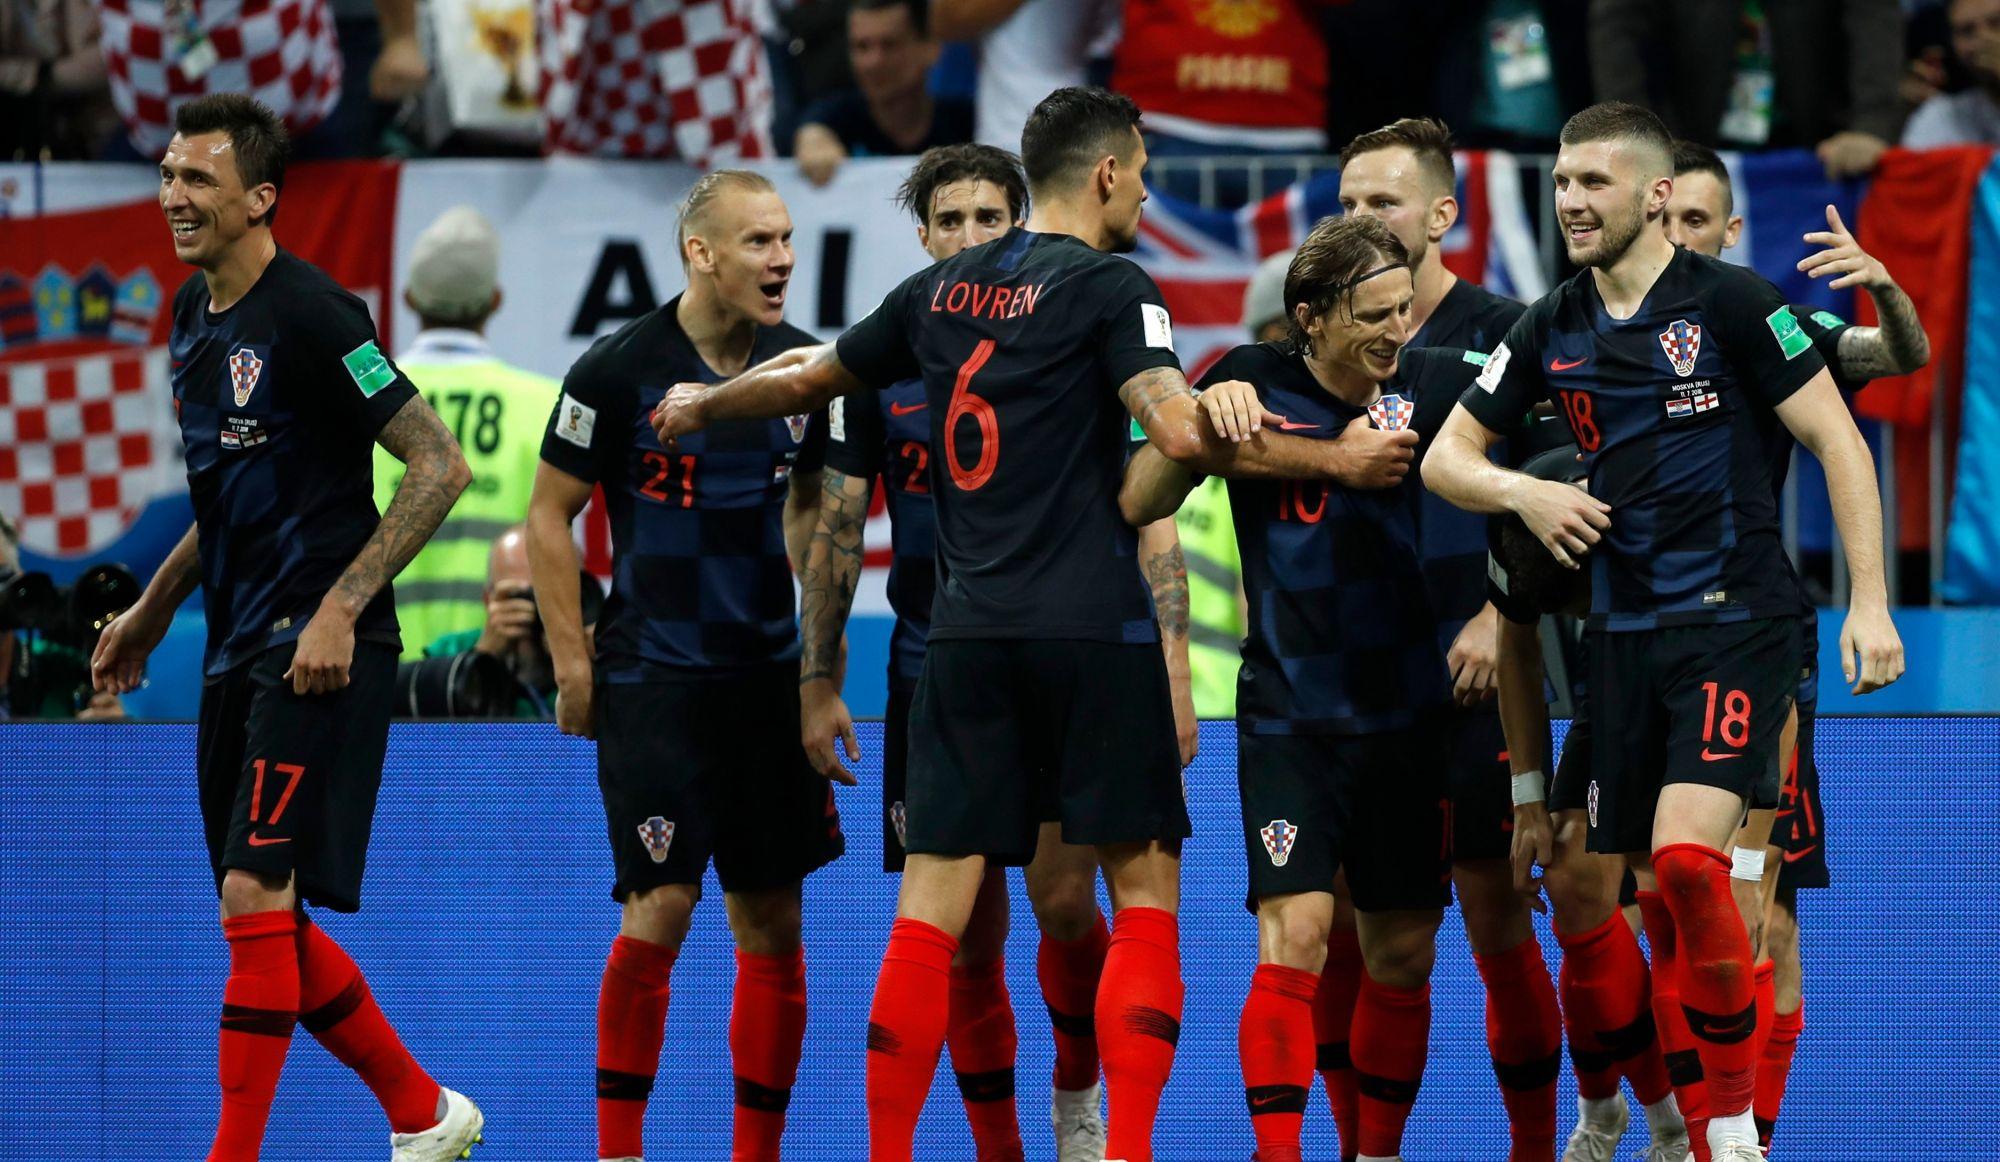 Ce sera une finale Croatie-France! (vidéo)